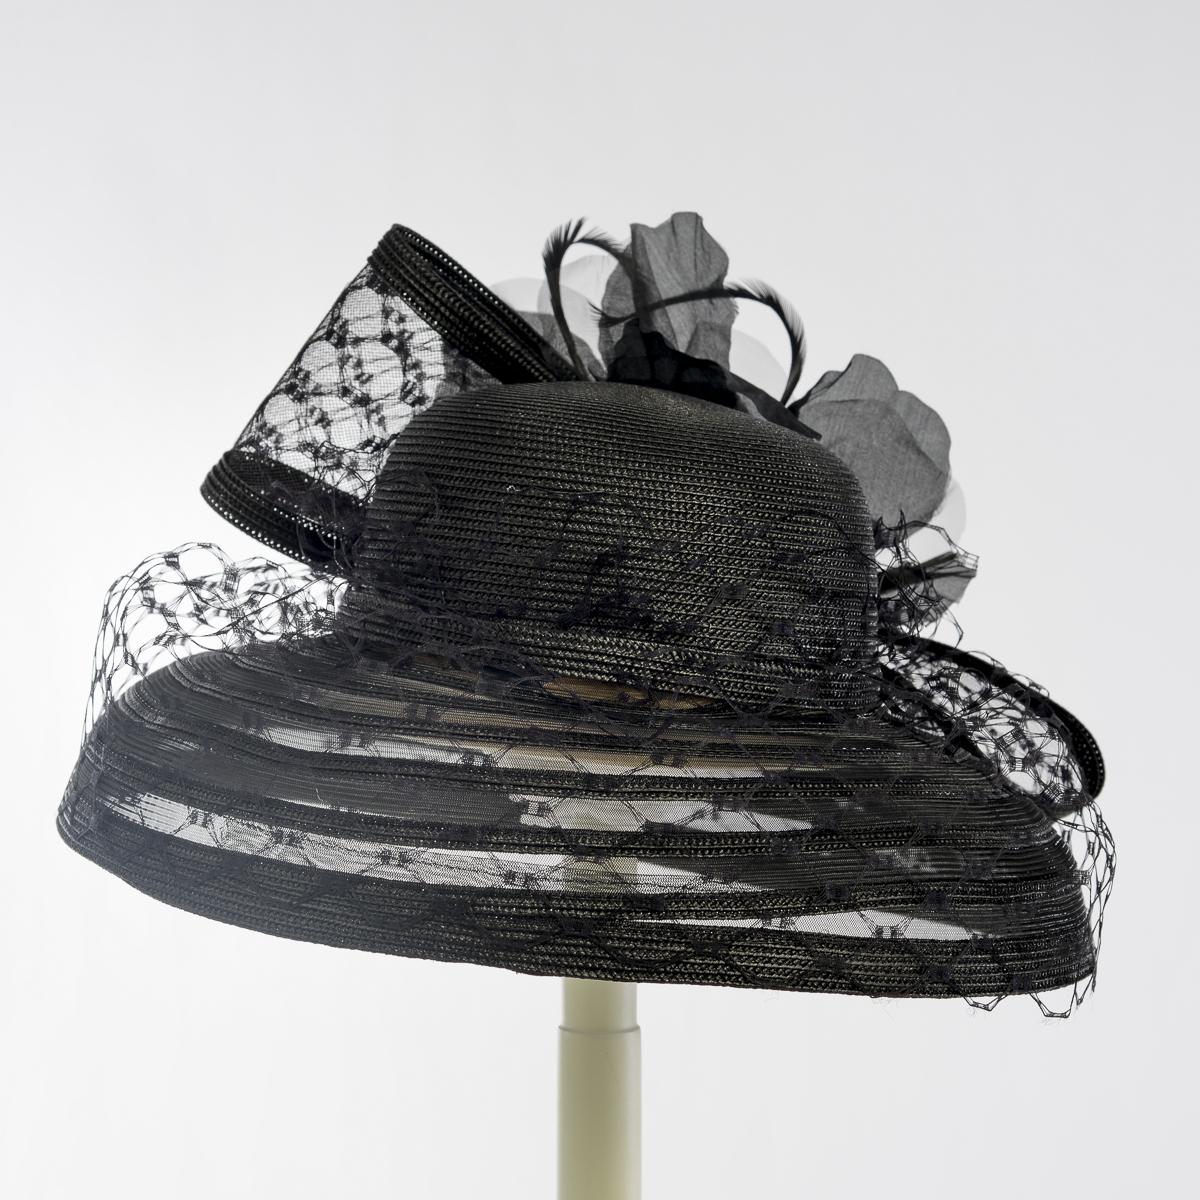 Black Crinoline Brim Silk Flower Veiling Bow Hats 301759 Bk Sun